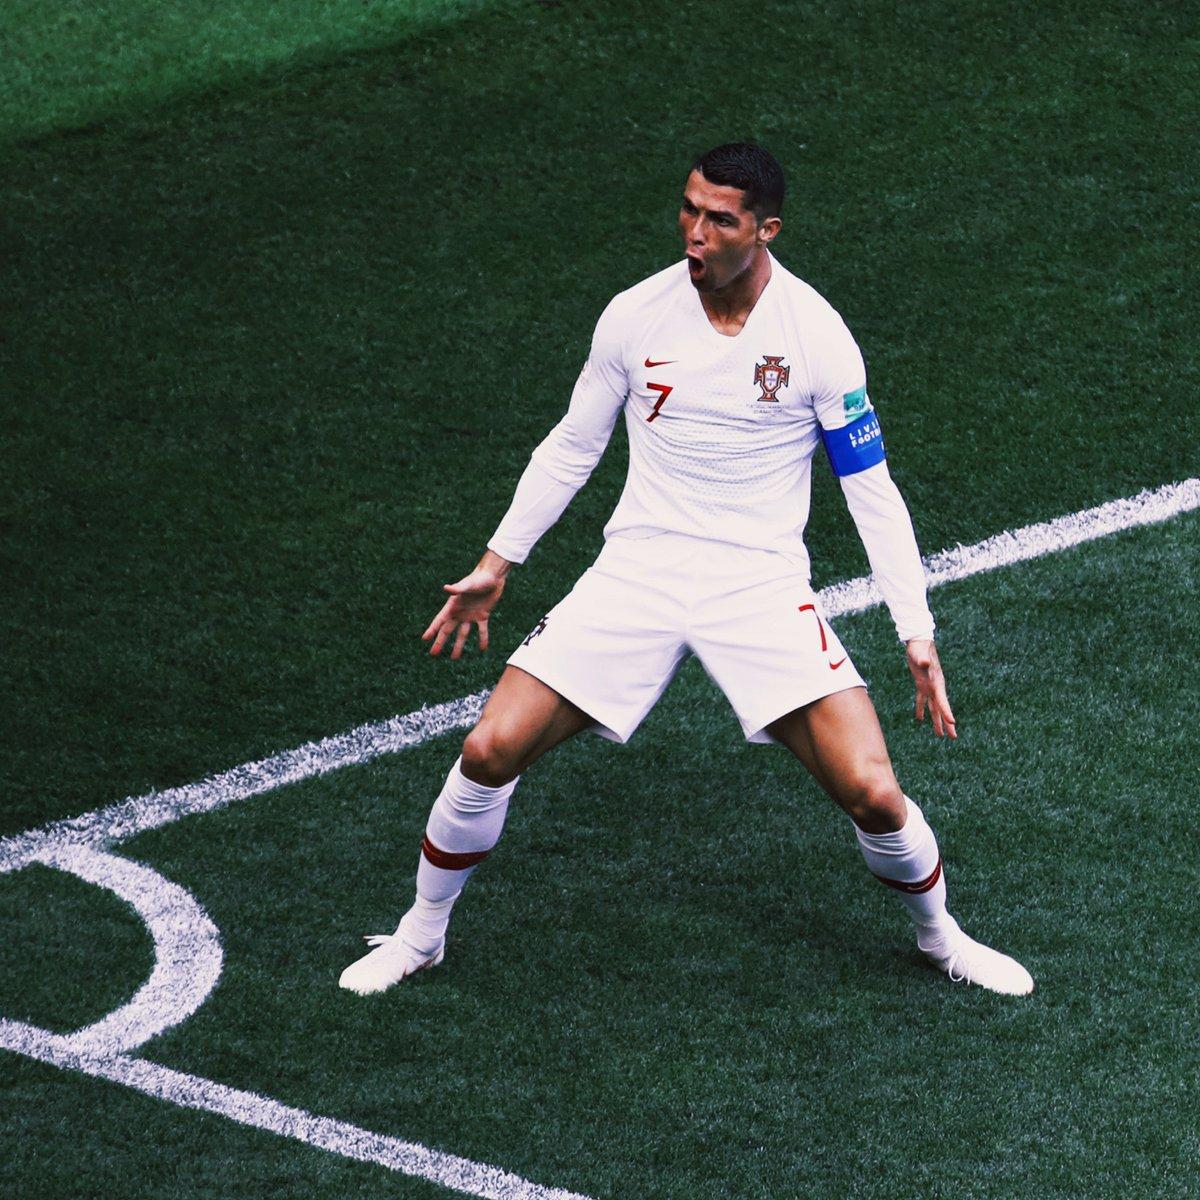 #WorldCup Top-scorers so far.. 🇵🇹 Cristiano Ronaldo: 4 🇷🇺 Denis Cheryshev: 3 🇪🇸 Diego Costa: 3 🏴 Harry Kane: 2 🇧🇪 Romelu Lukaku: 2 Who will win Golden Boot?